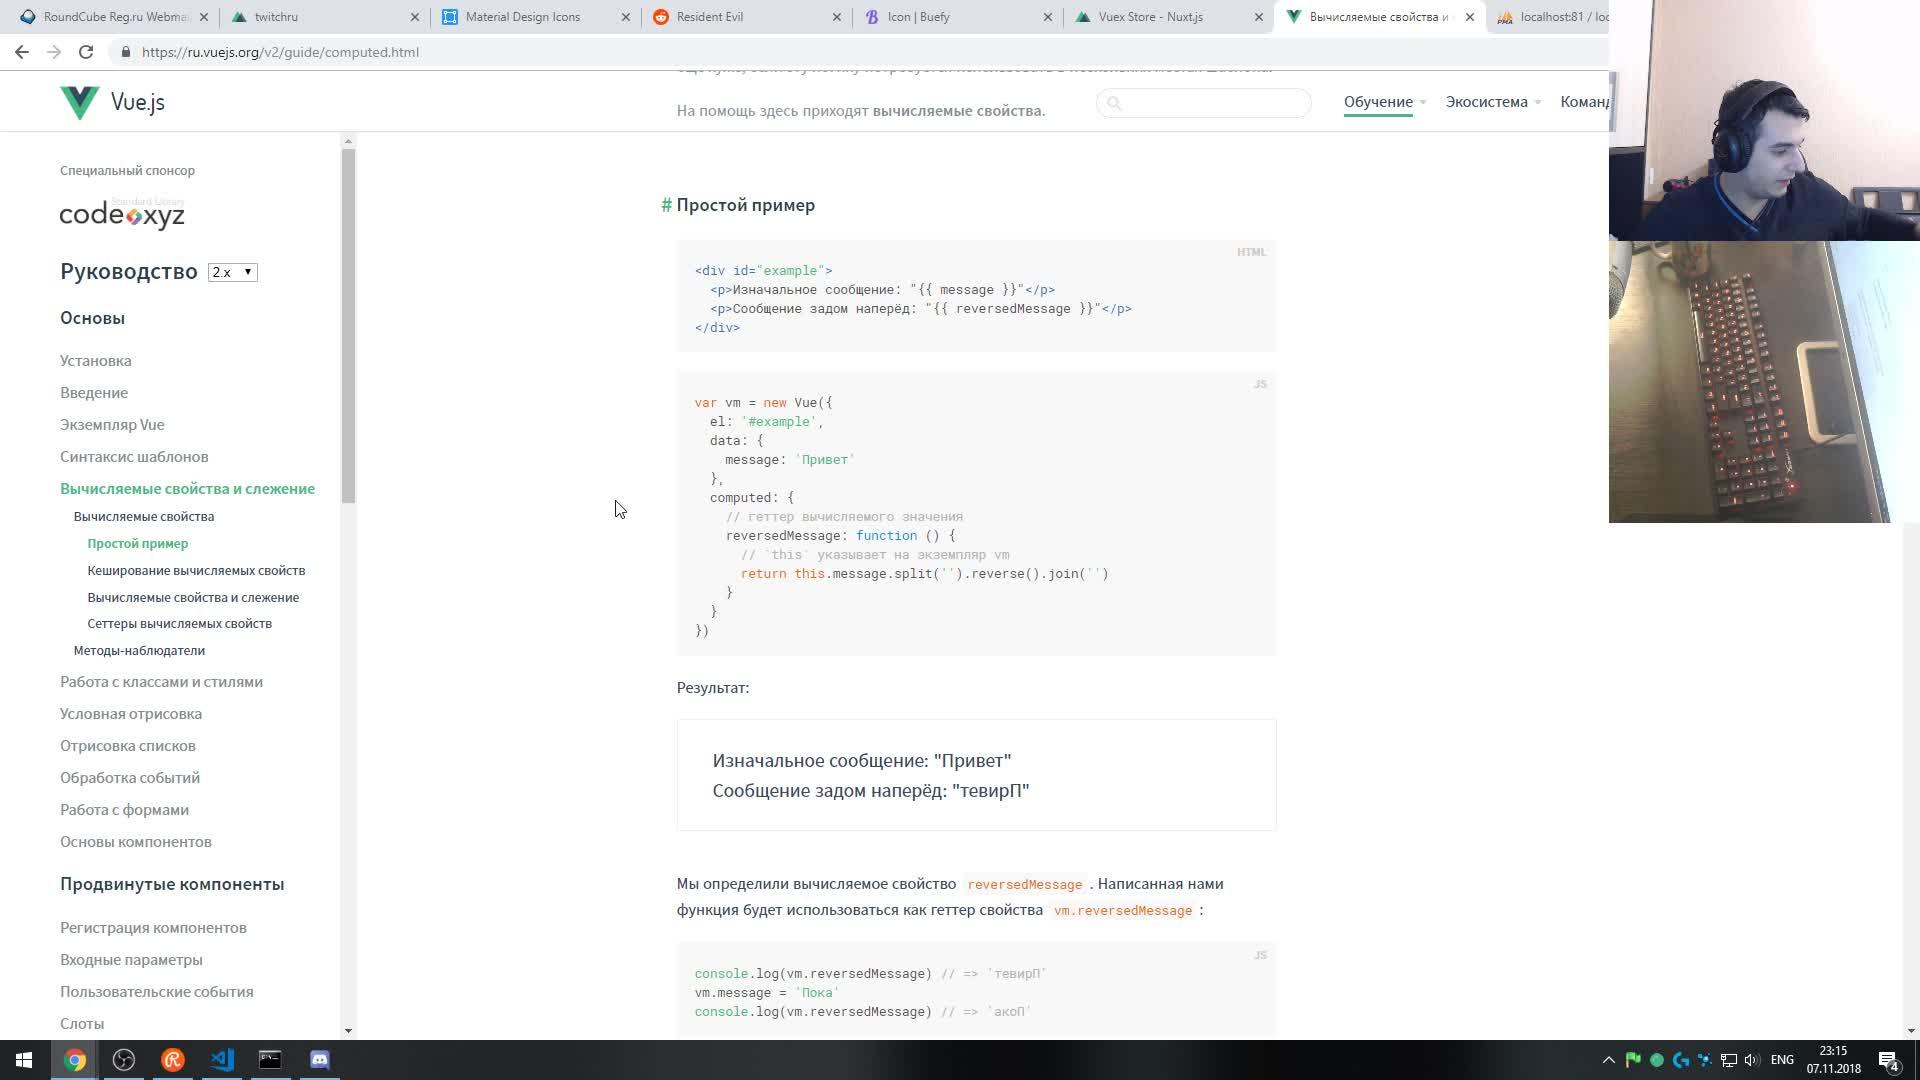 solleo - Различные проекты  HTML, CSS, JS, Vue, Node JS - Twitch